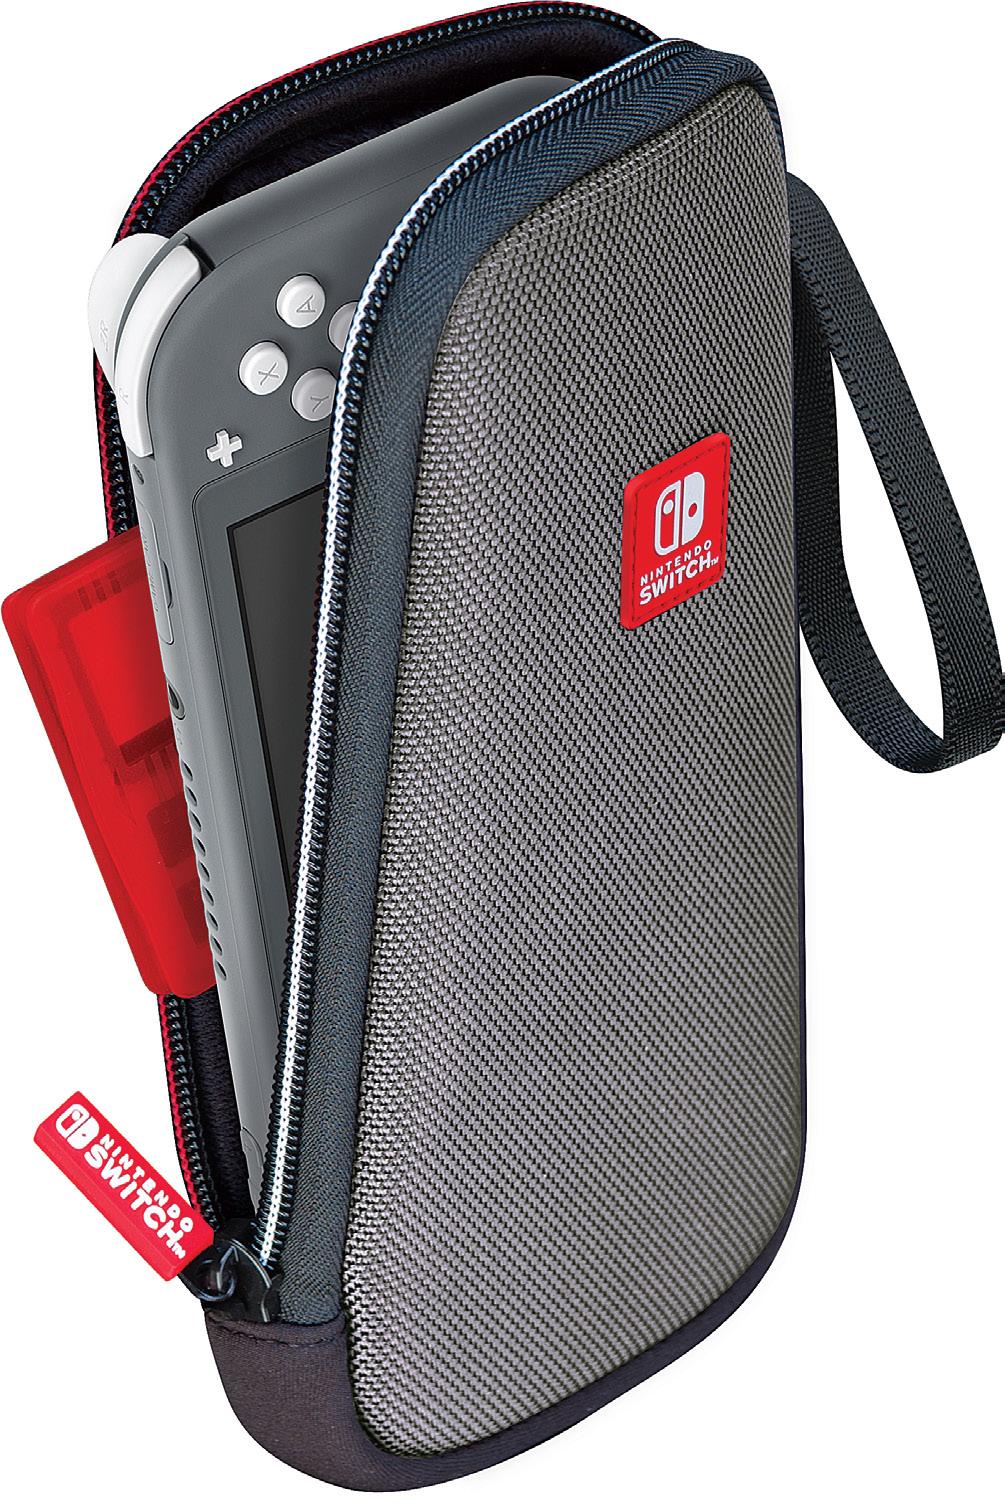 Big Ben Interactive Custodia Morbida per Nintendo Switch Lite - Nls115